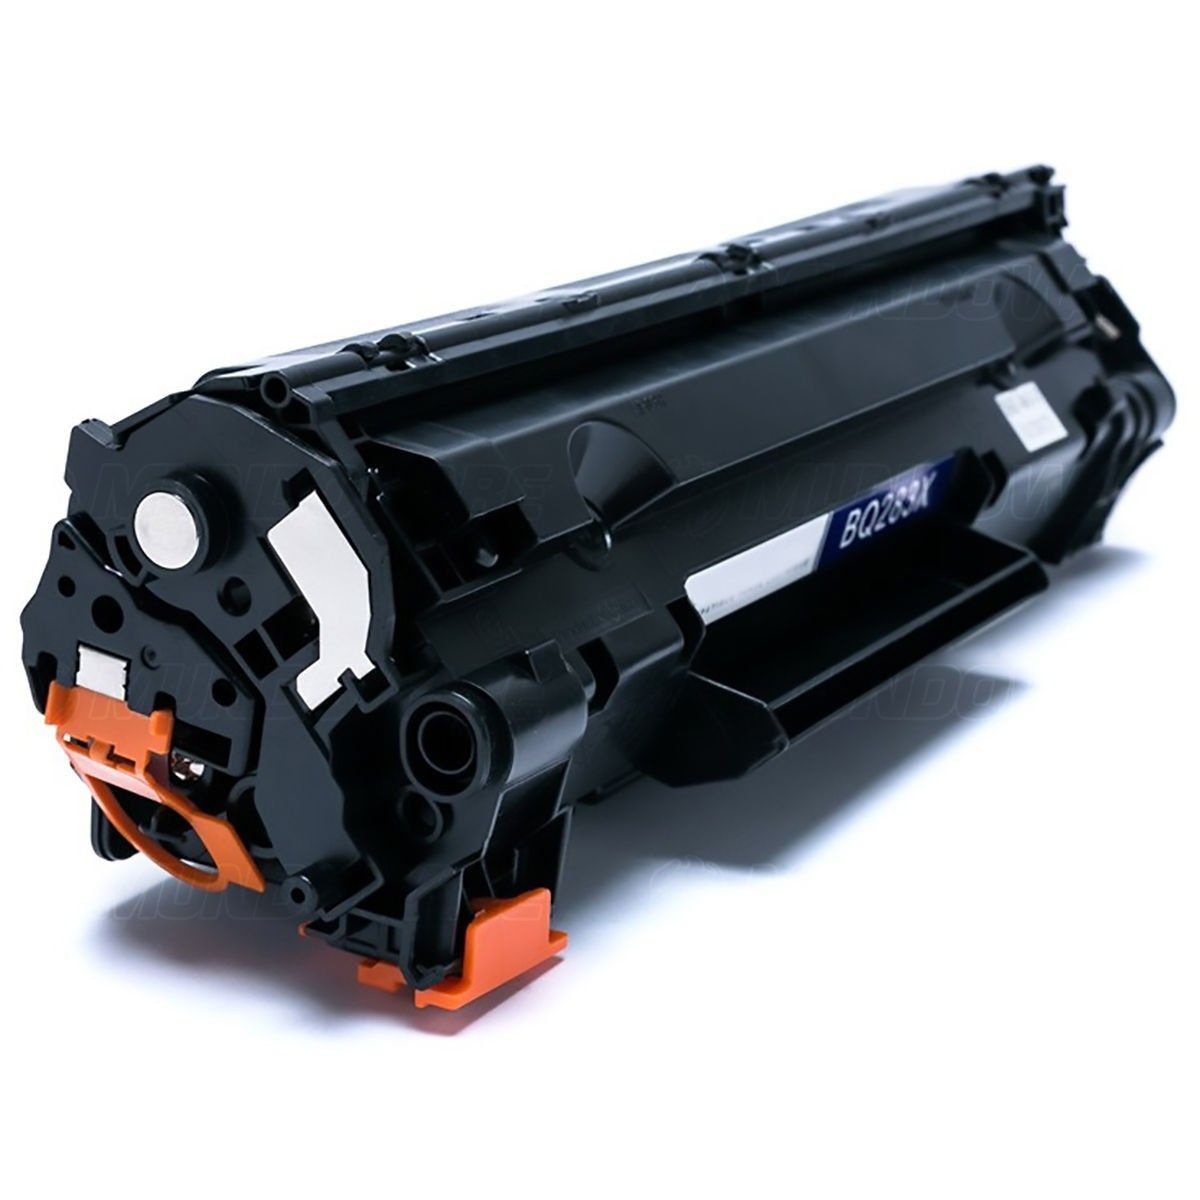 Compatível: Toner CF283X 283X 83X para HP M201n M201dw M225dn M225dw M226  M127fw M128fn / Preto / 2 500